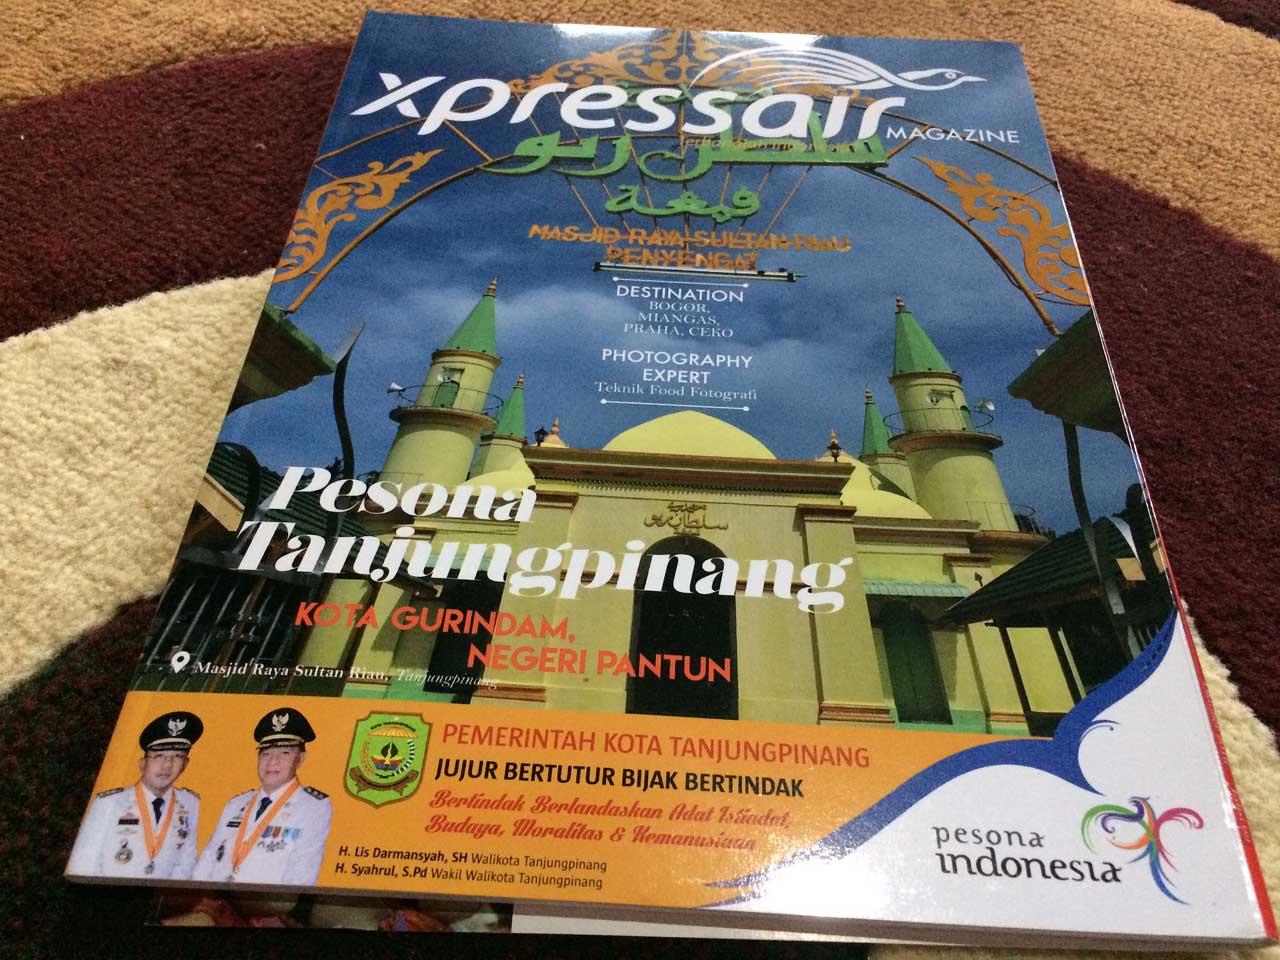 xpressair-inflight-mag-pulau-penyengat-oktober-2016-1